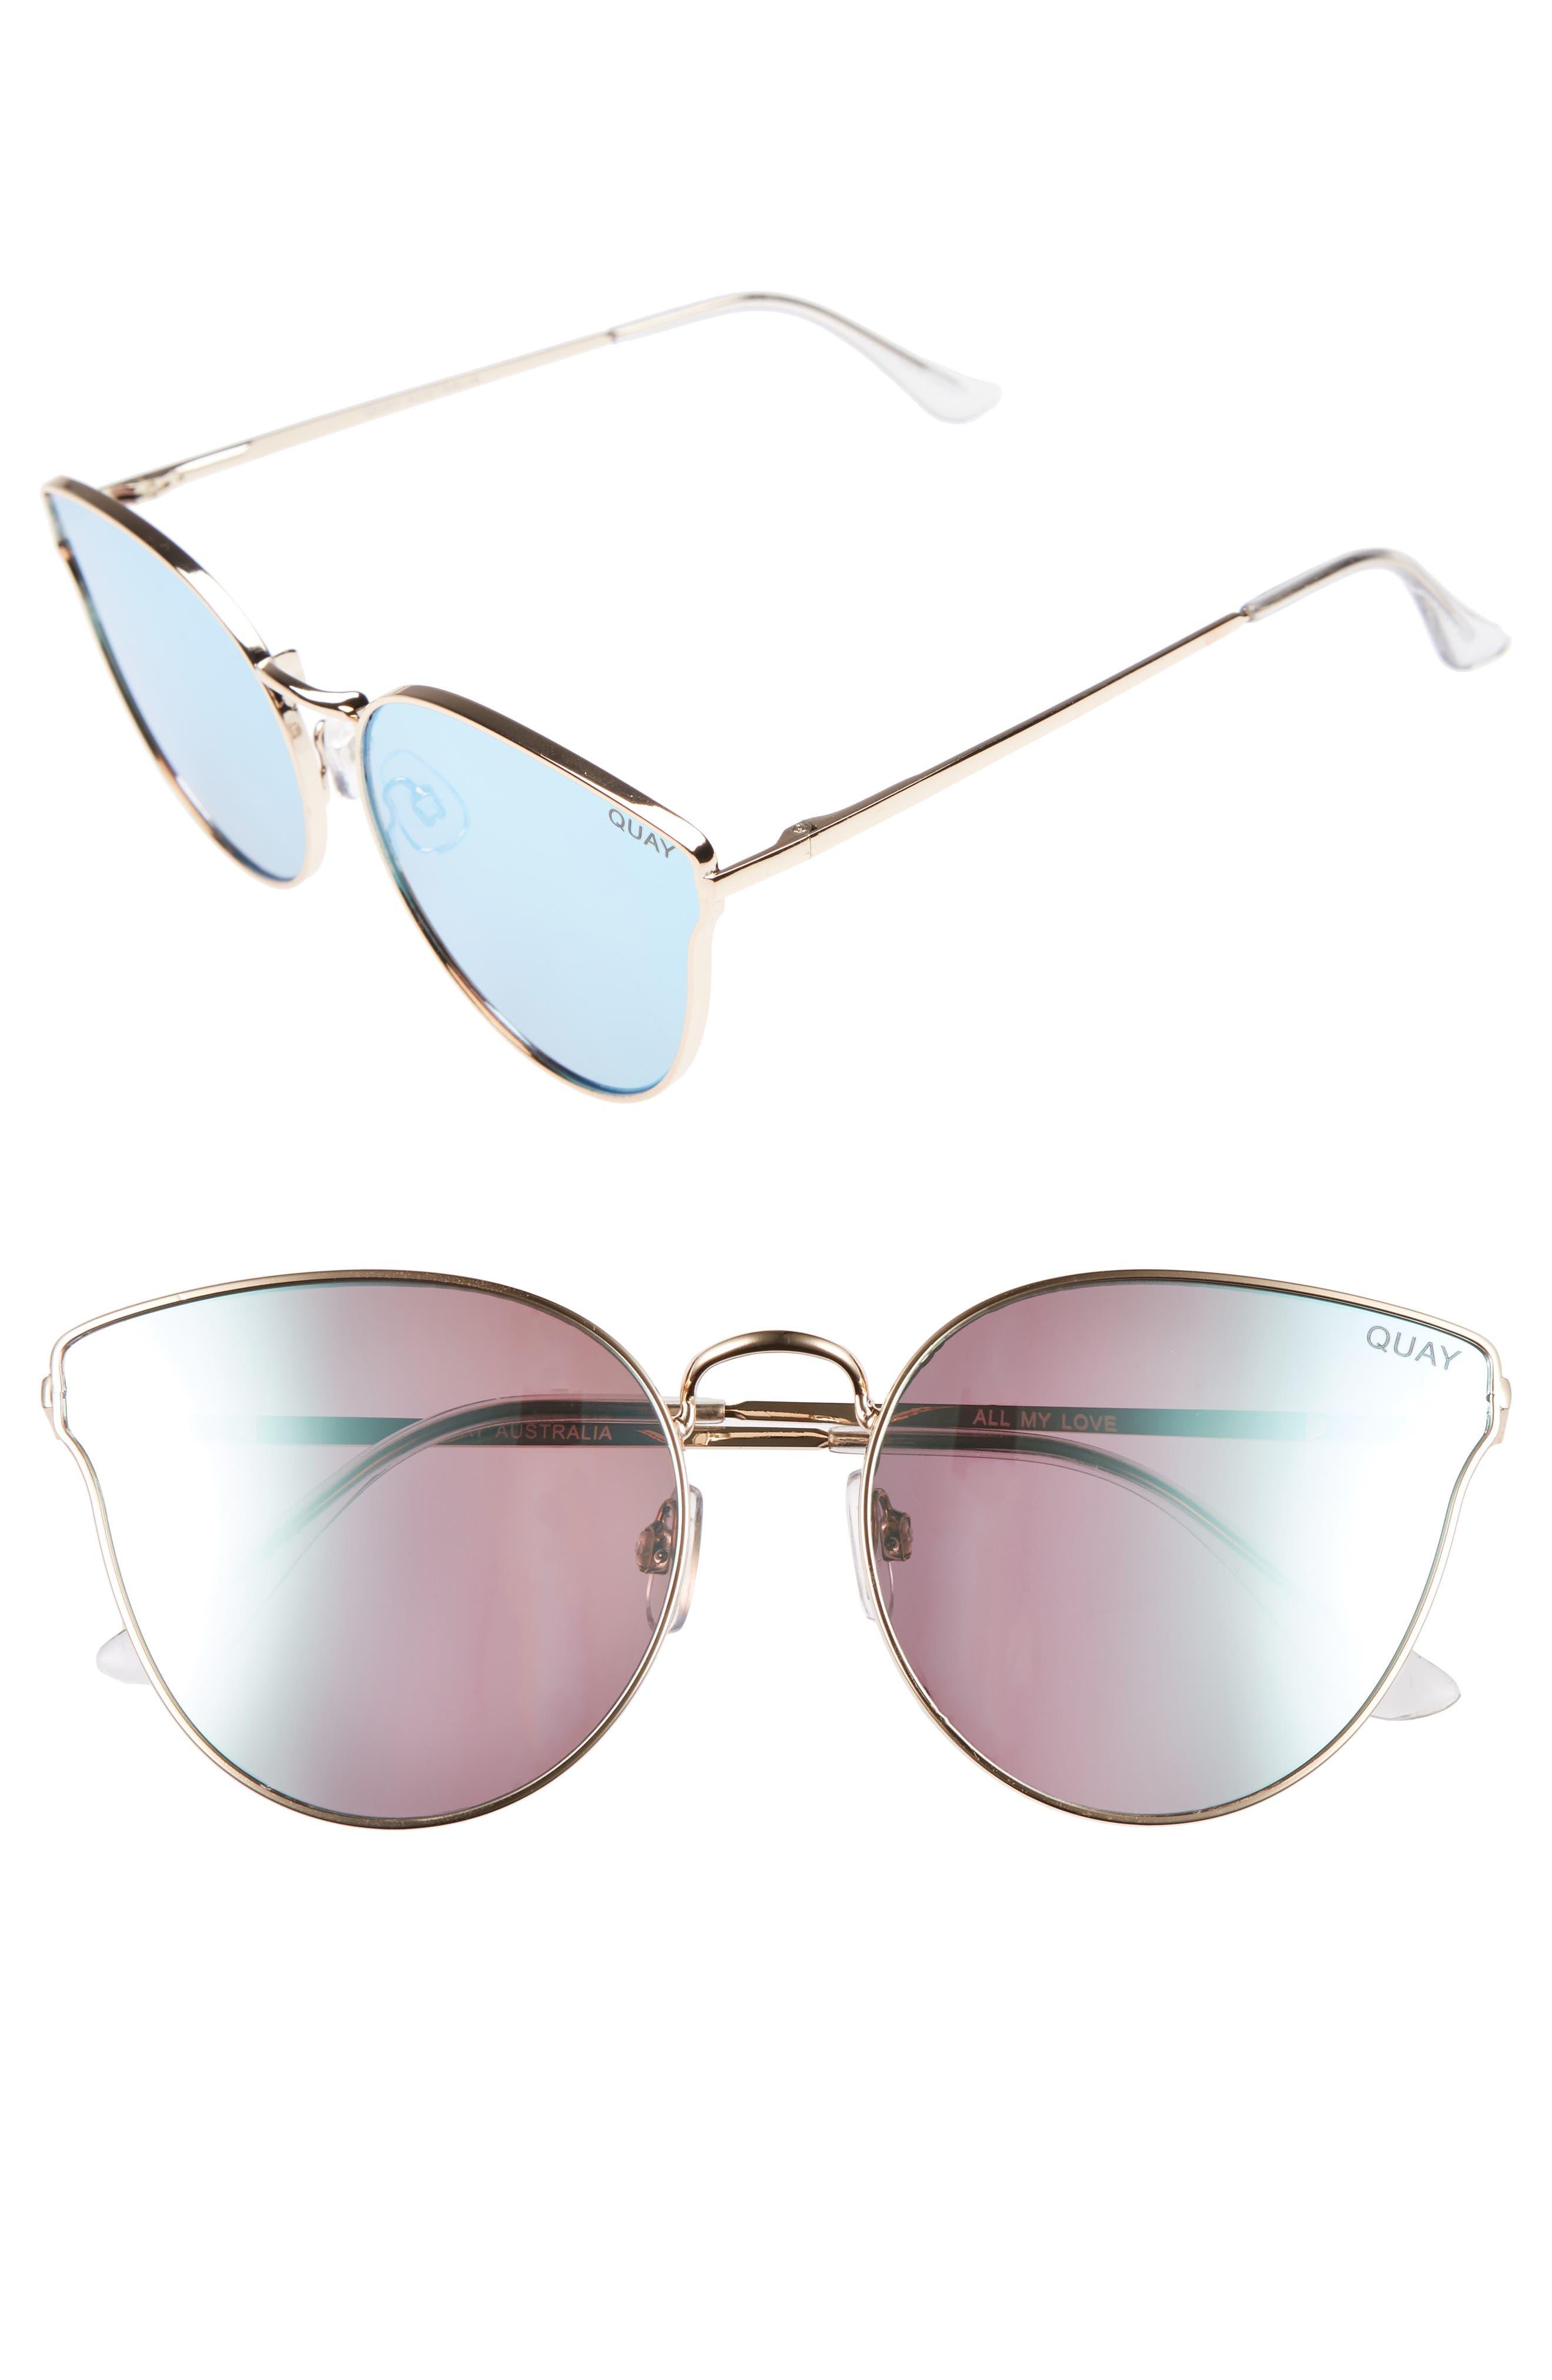 Main Image - Quay Australia 'All My Love' 60mm Retro Sunglasses